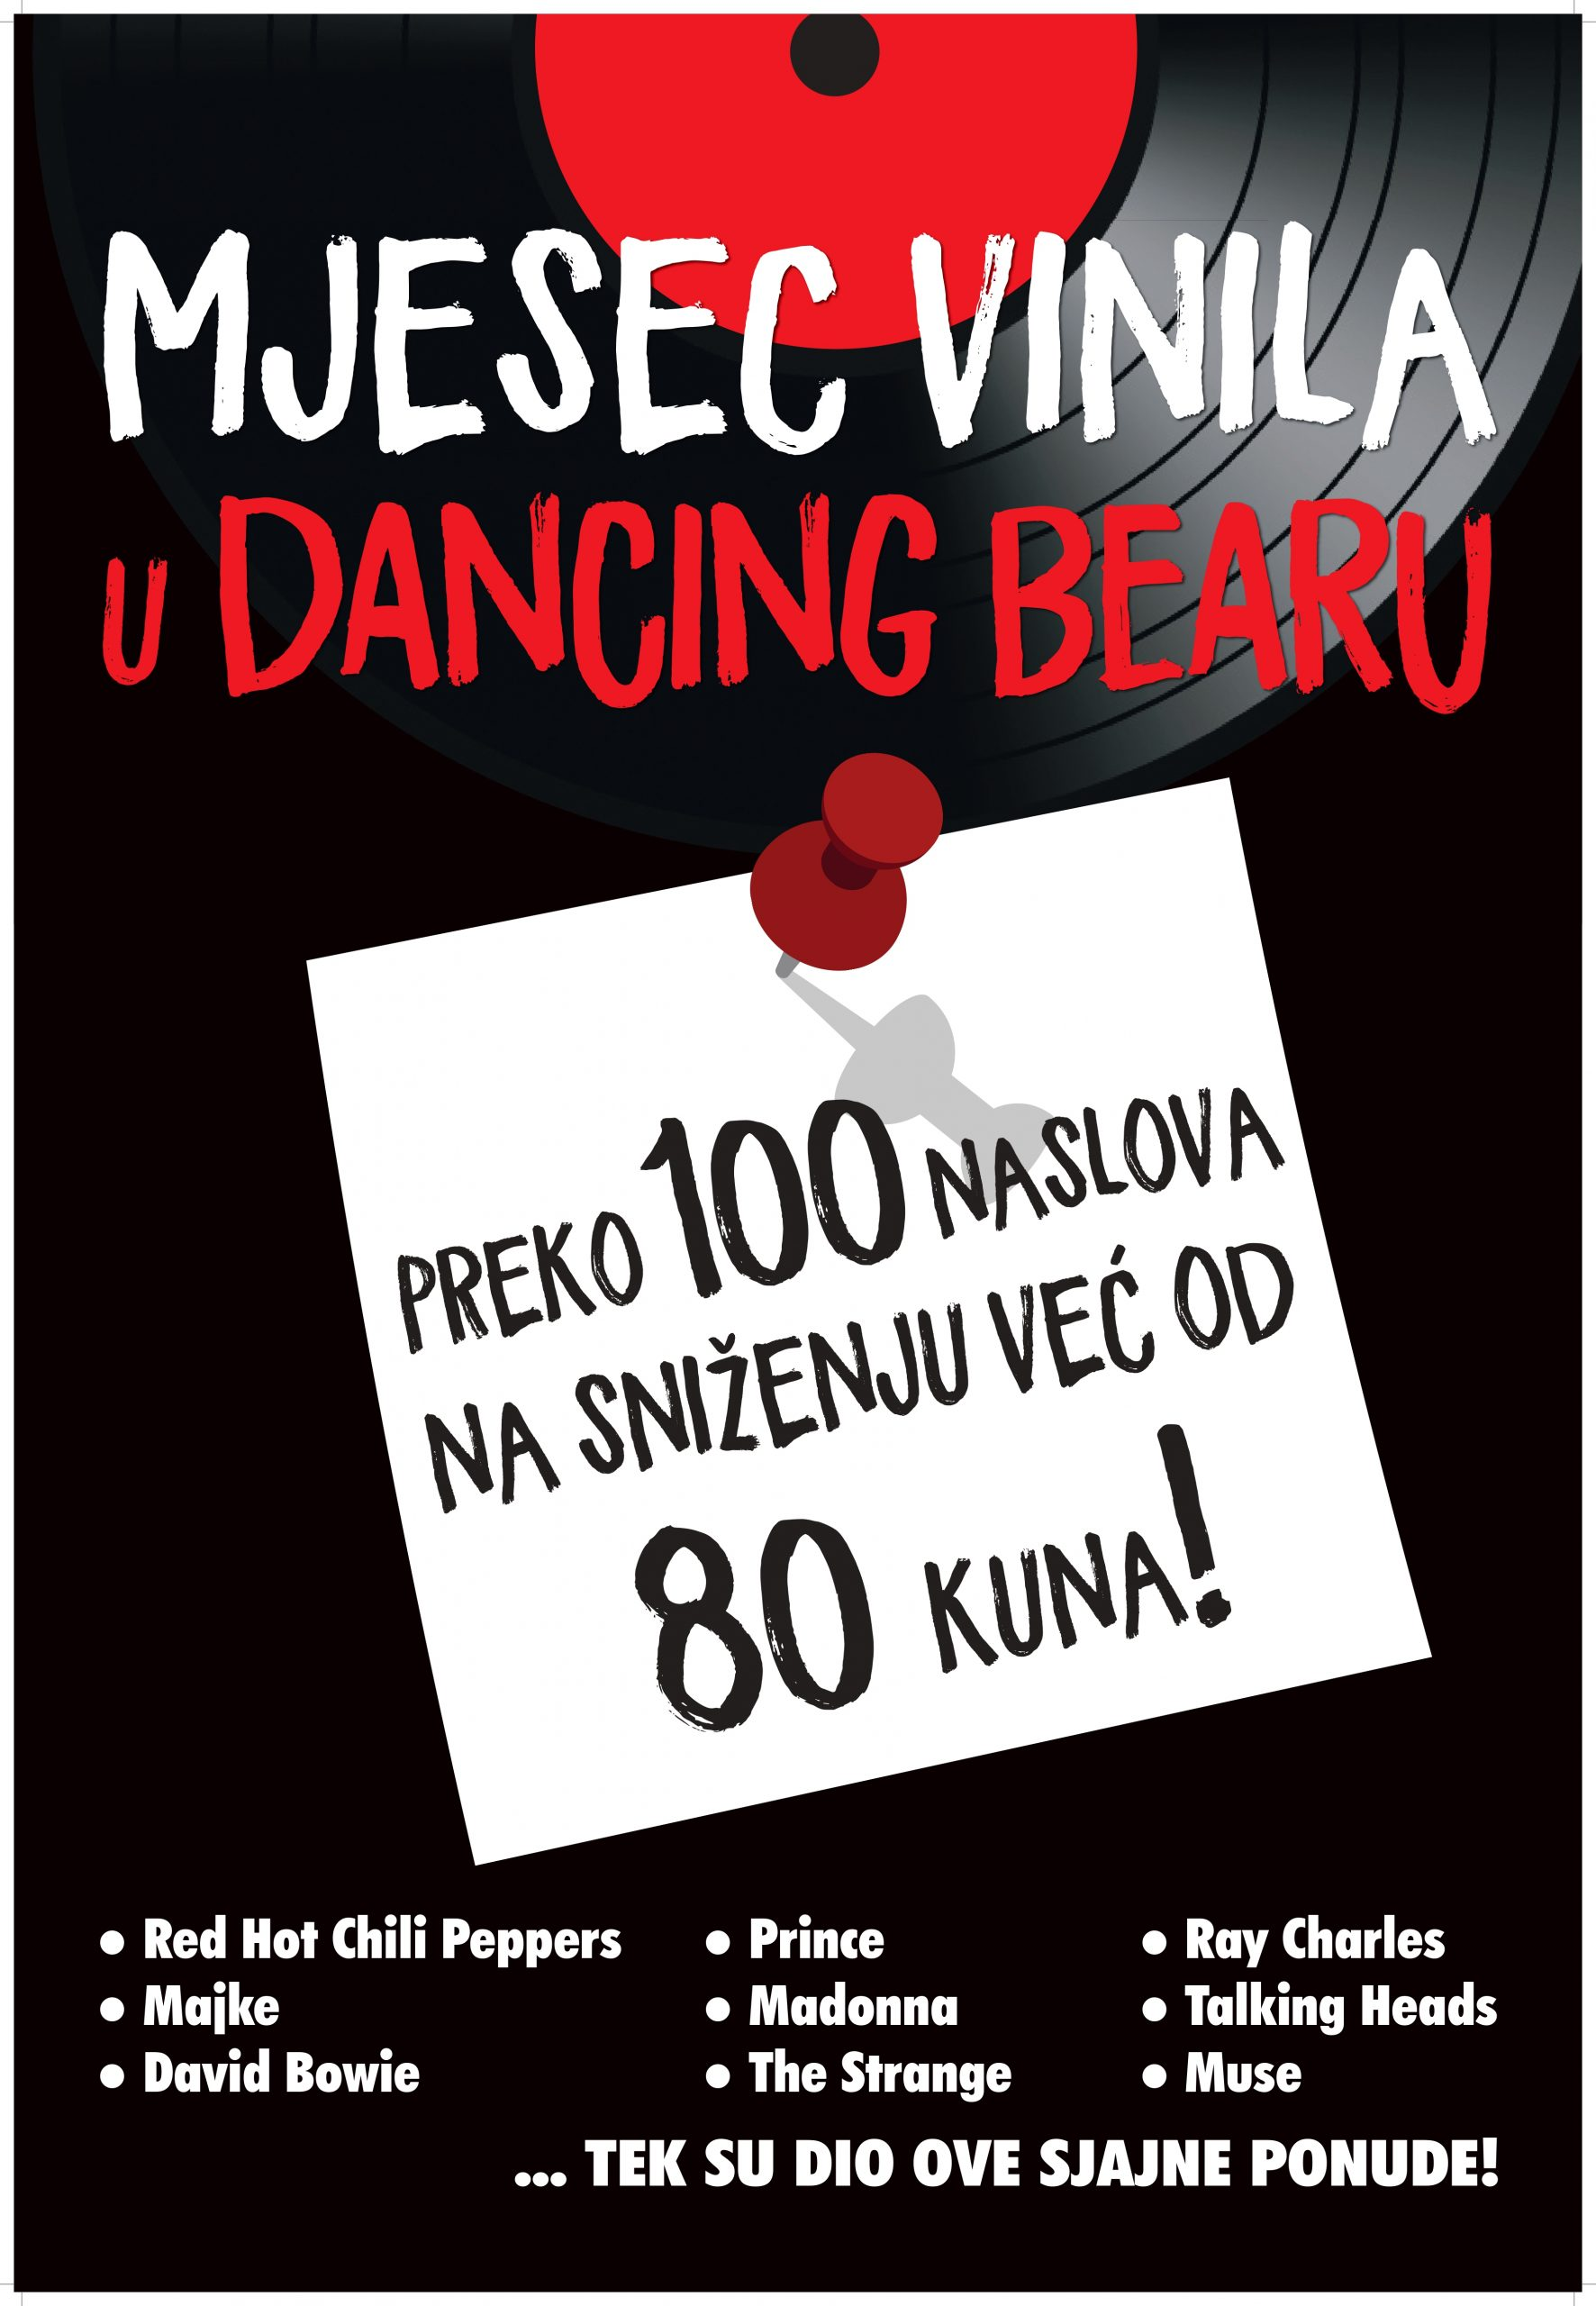 Dancing Bear shop akcija, vinili